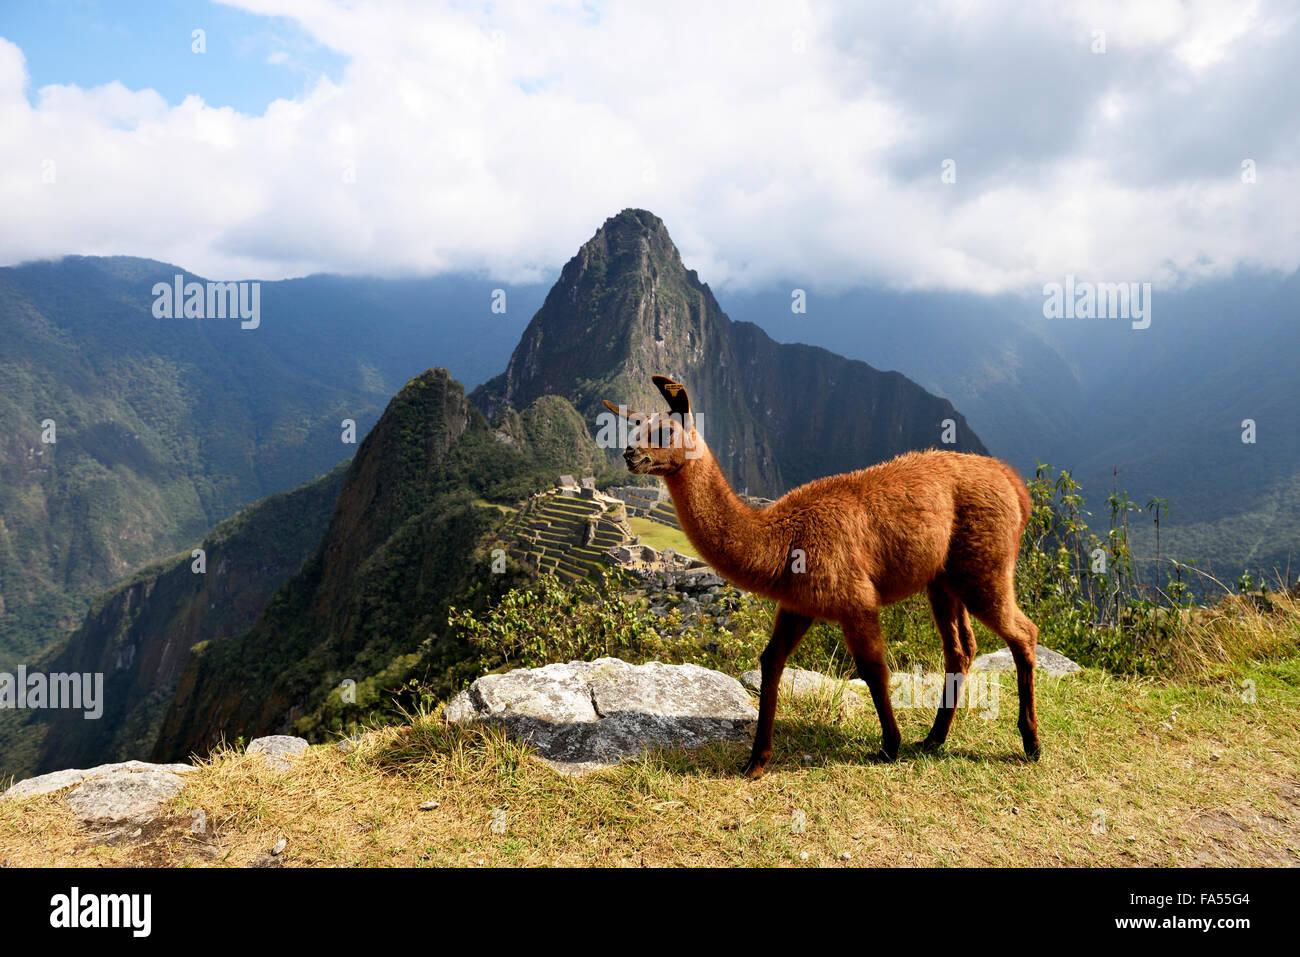 Lama (Lama Glama) vor Ruinenstadt, Inka-Stadt Machu Picchu, Huayna Picchu Berg hinter World Heritage Site Stockbild